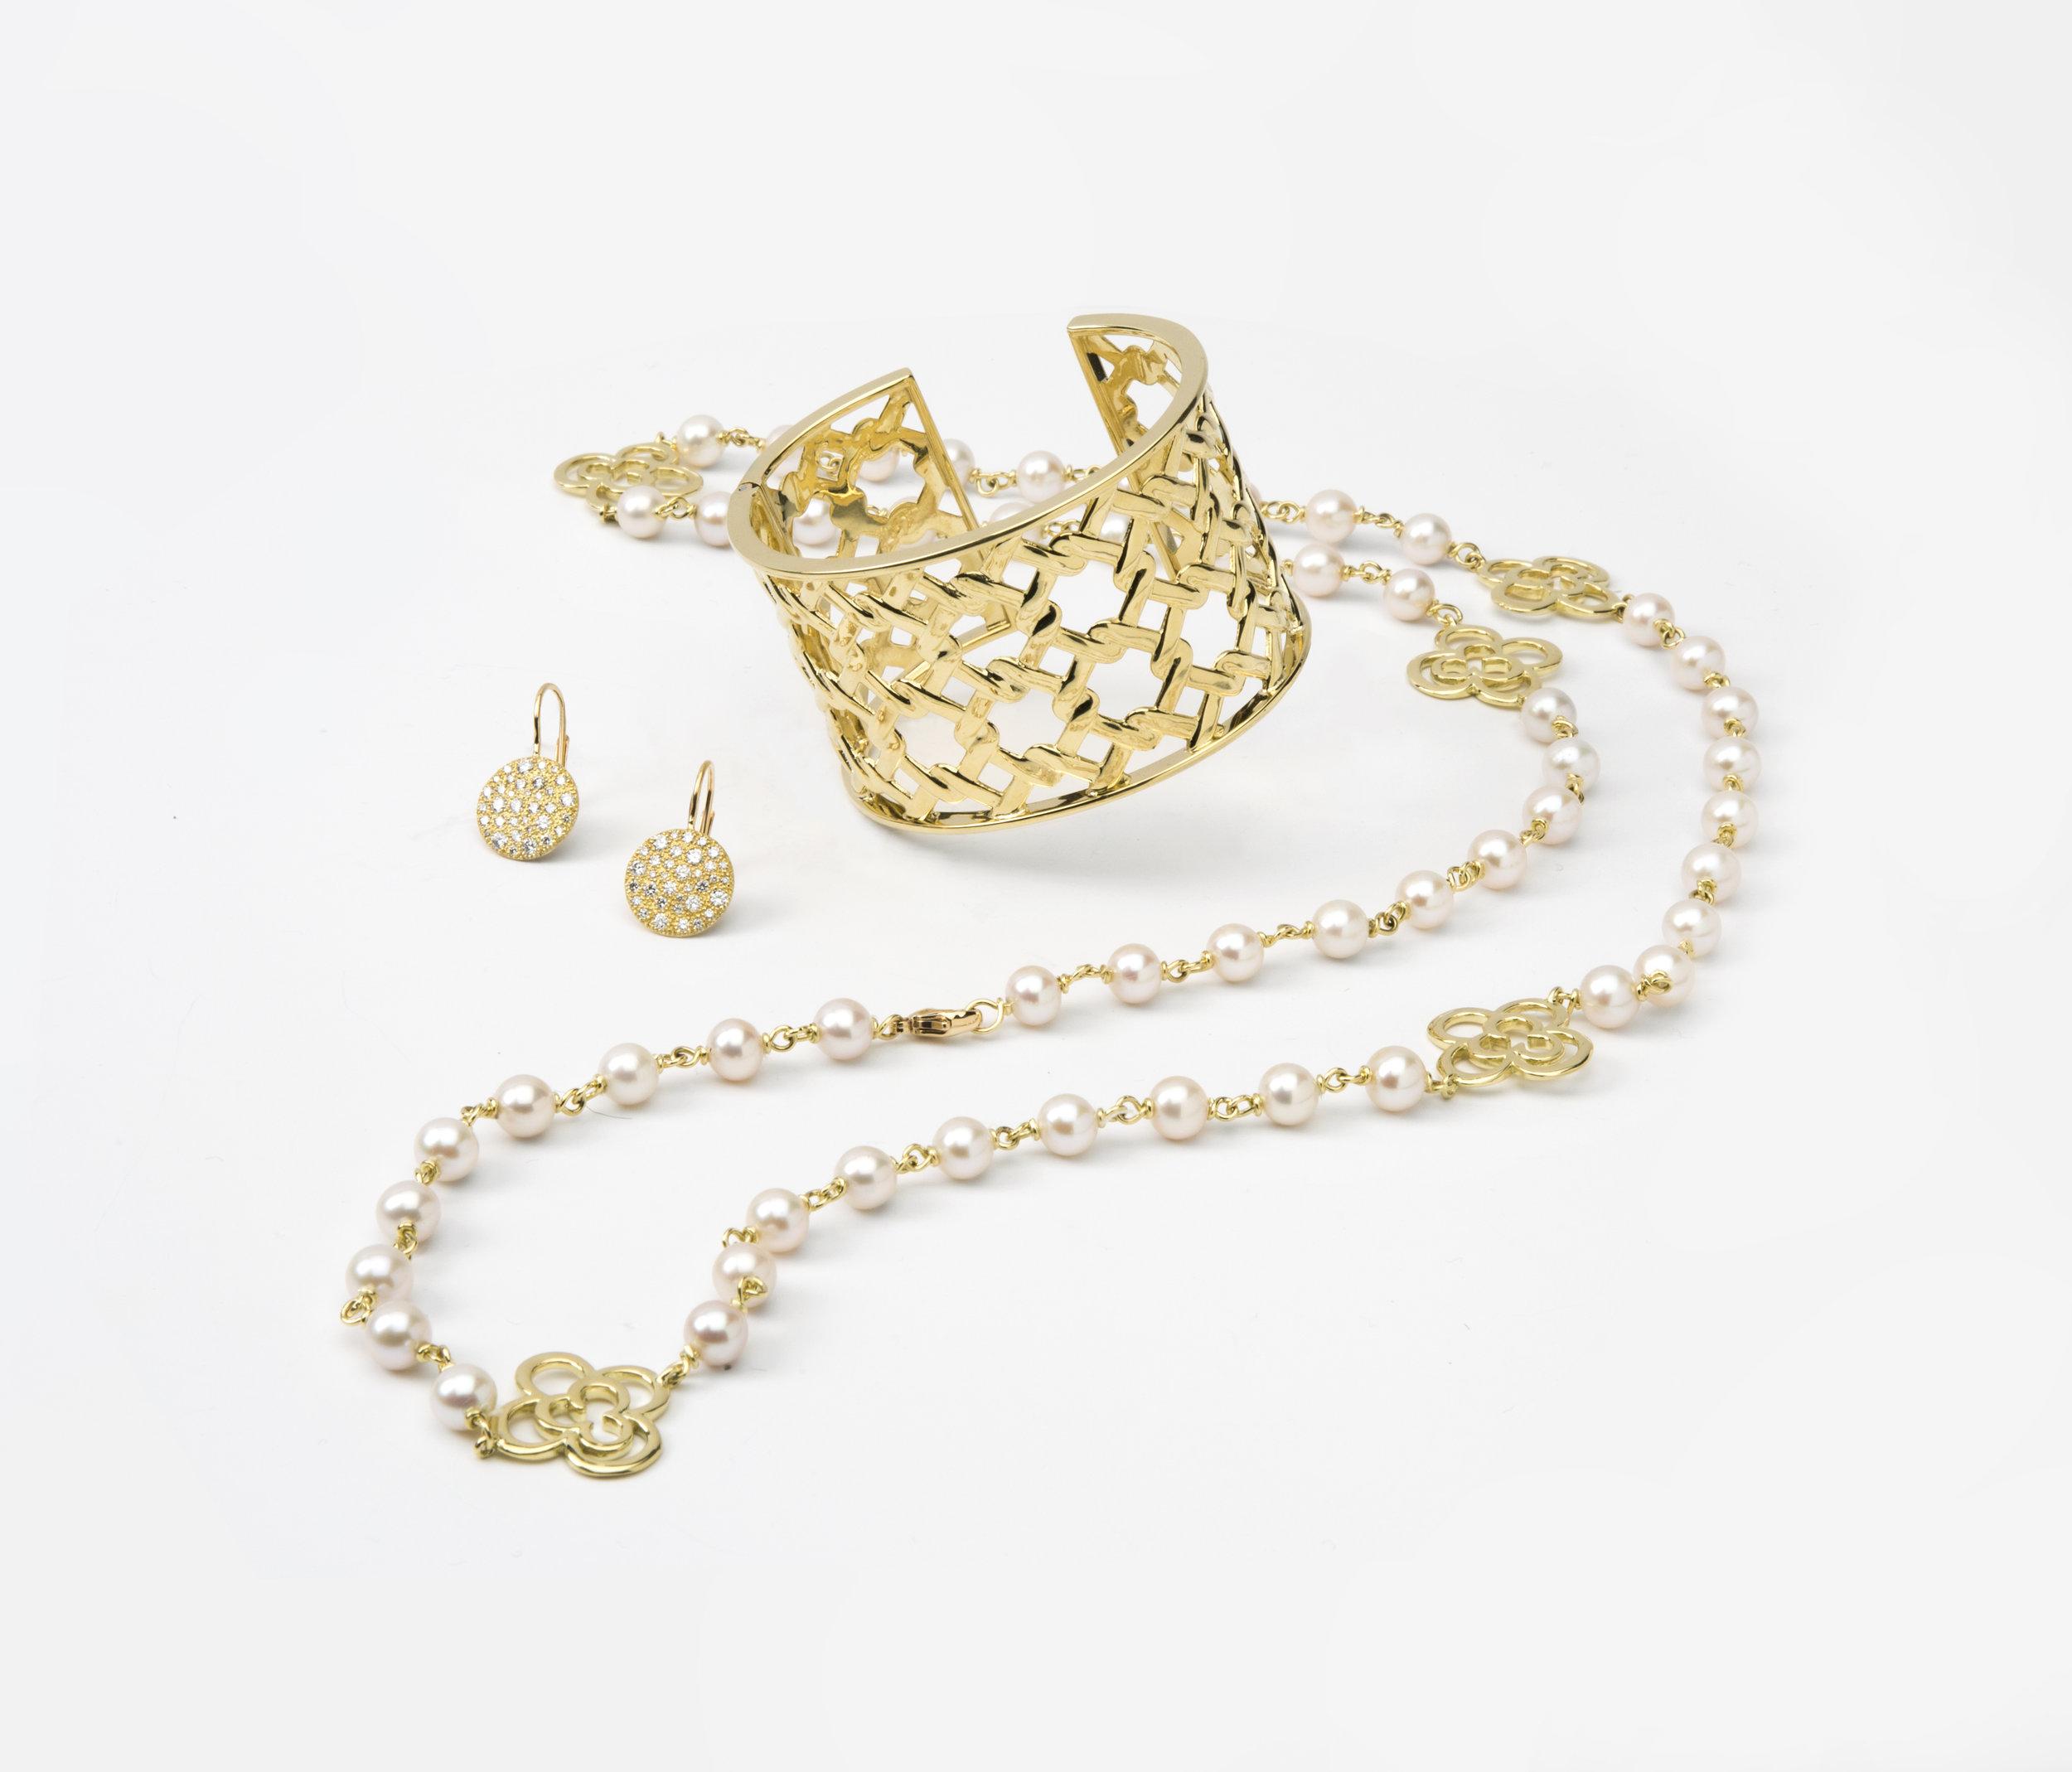 _P6A1292SmartObject-Jewelry-Editorial.jpg